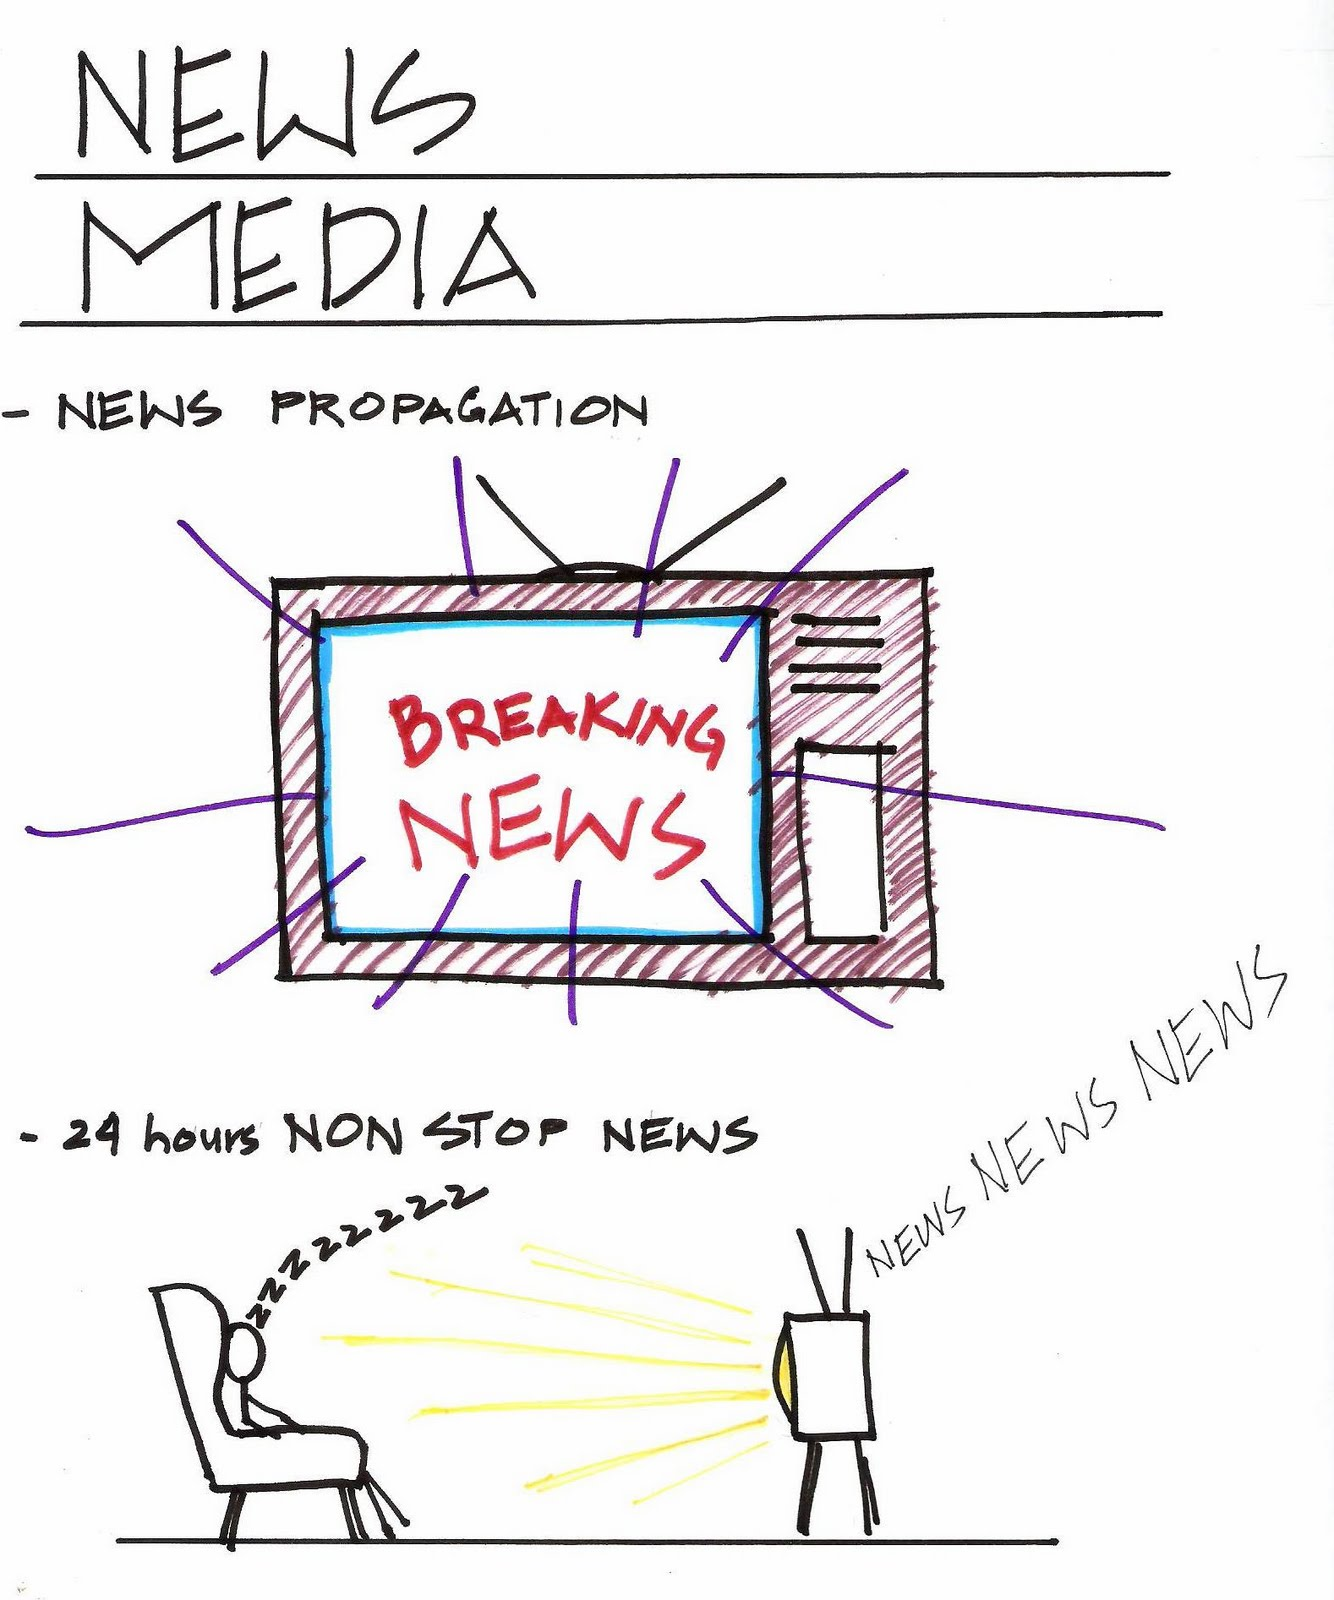 Evolution of mass media through the 20th century